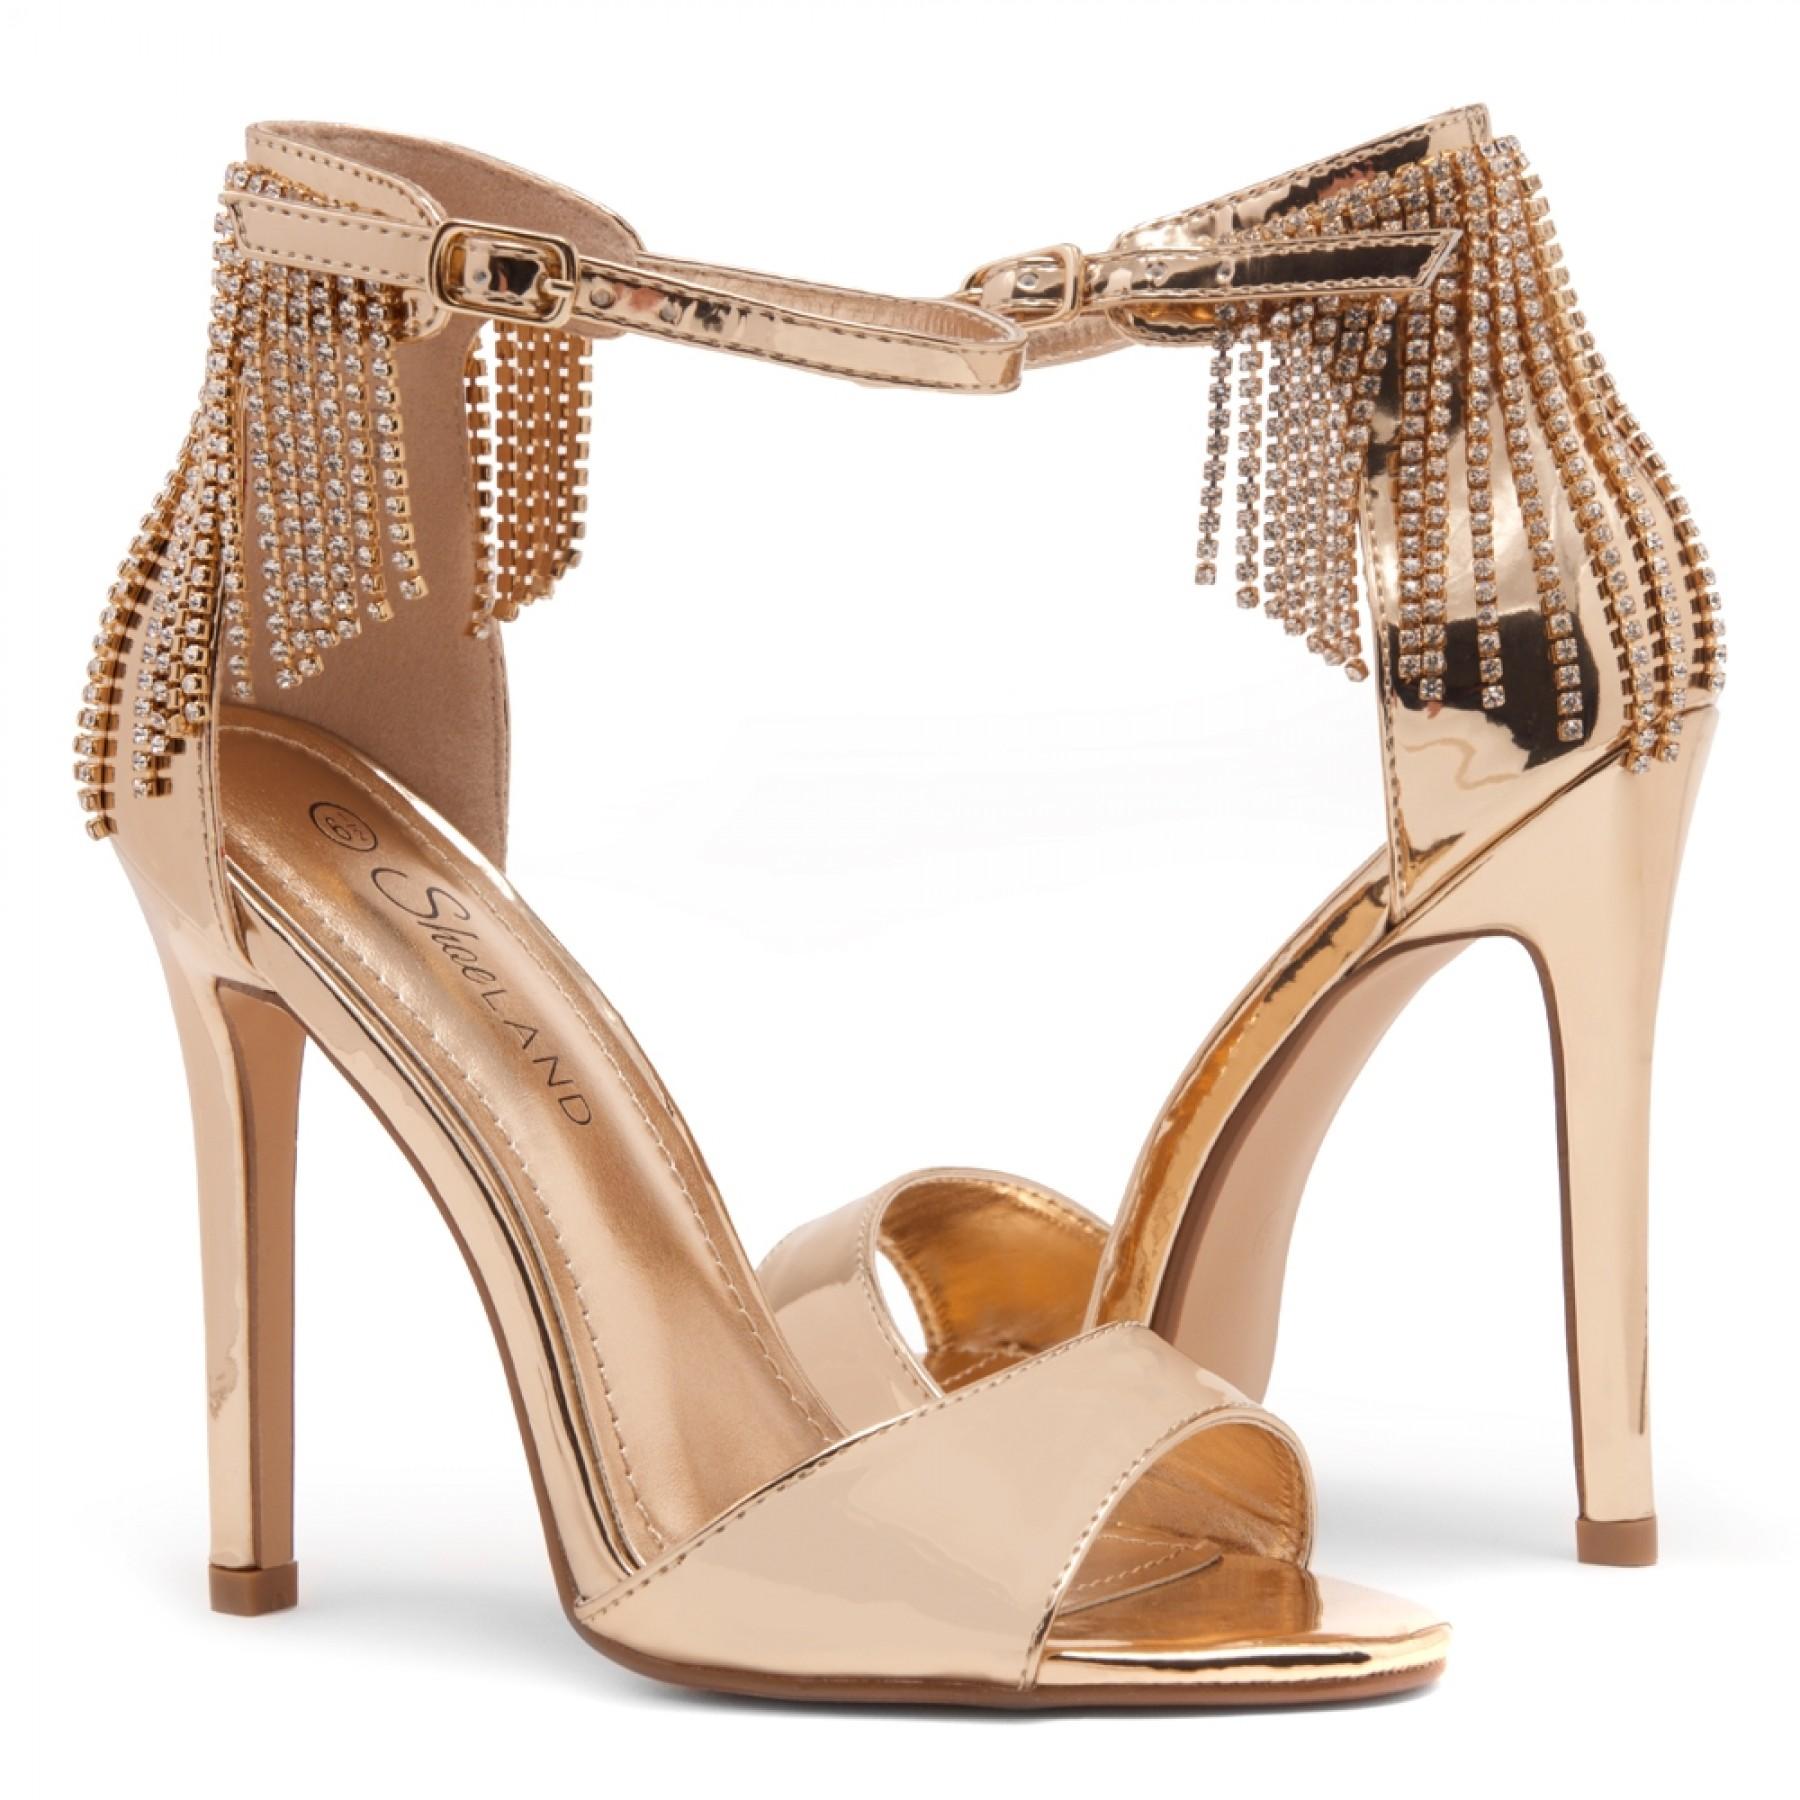 Shoe Land Charming- Rhinestone Tassel Ankle Strap Open Toe Stiletto Heel (1836/R.GLD)